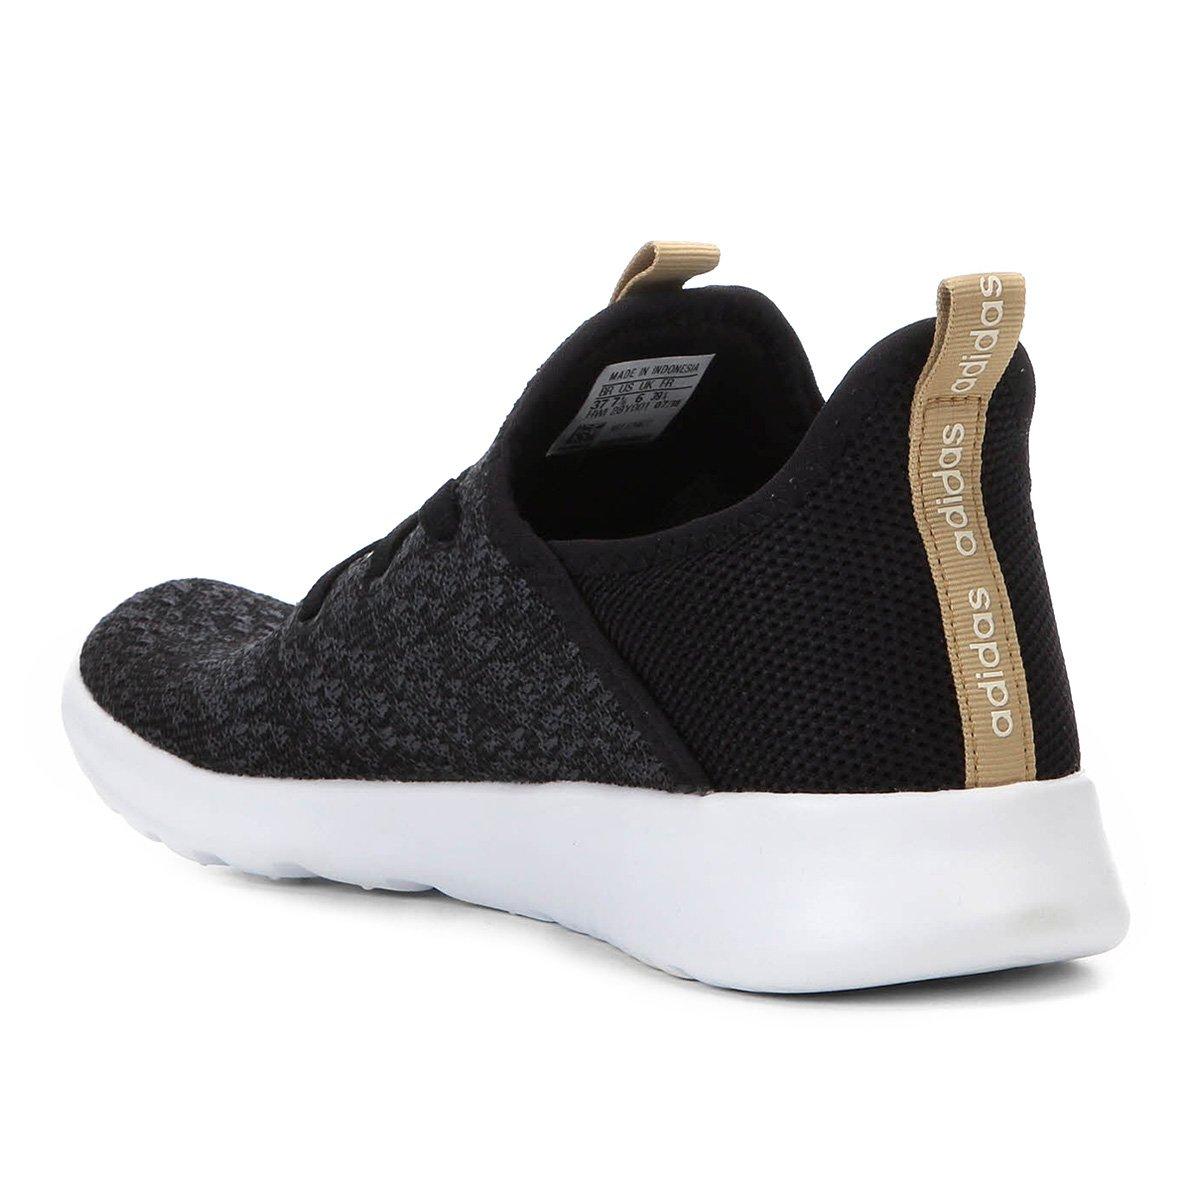 a133ef5b1 Foto 2 - Tênis Adidas Cloudfoam Pure W Feminino